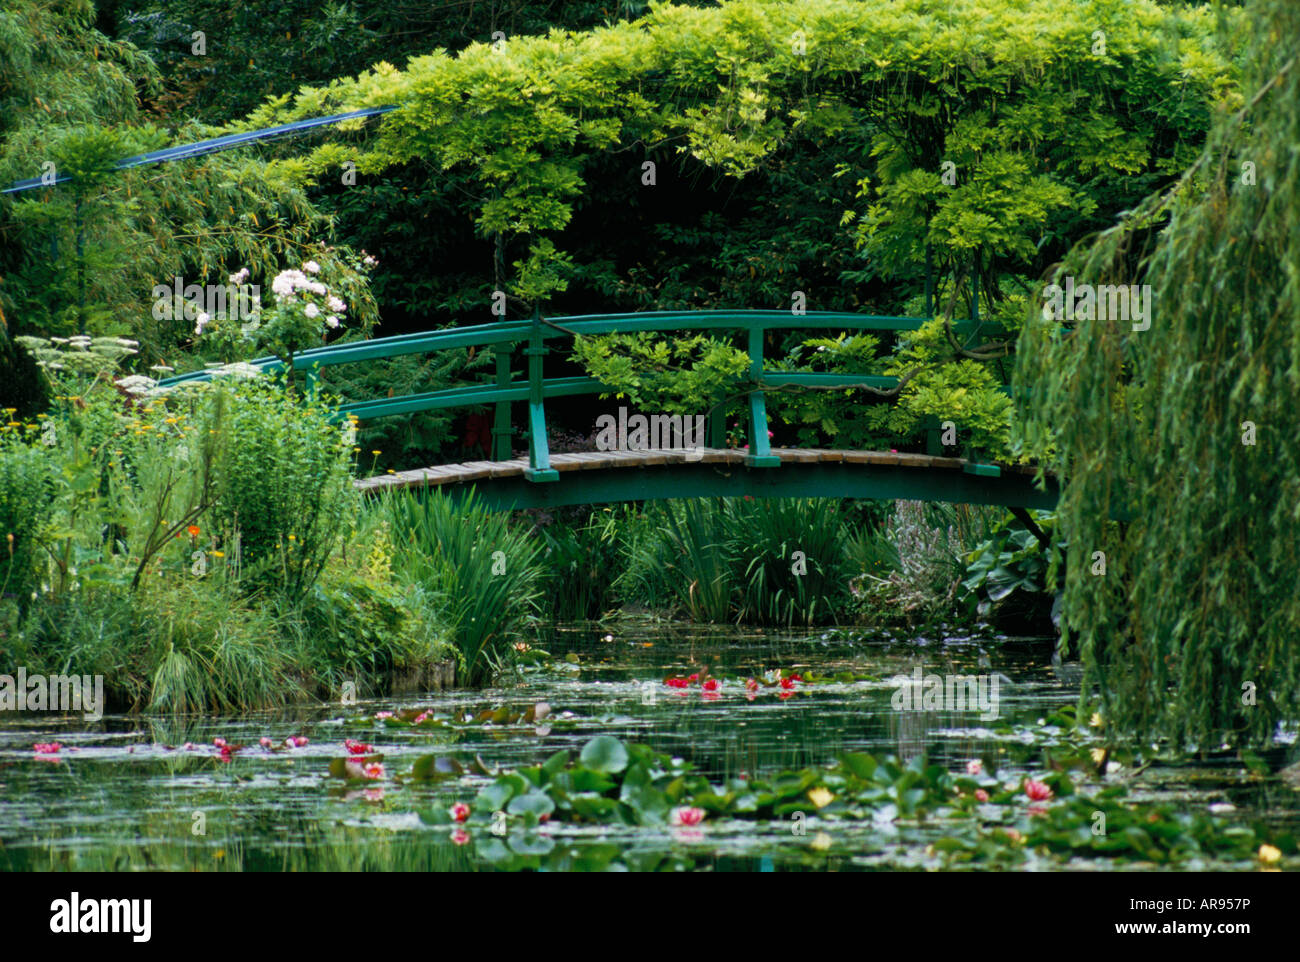 the-wisteria-covered-japanese-bridge-ove